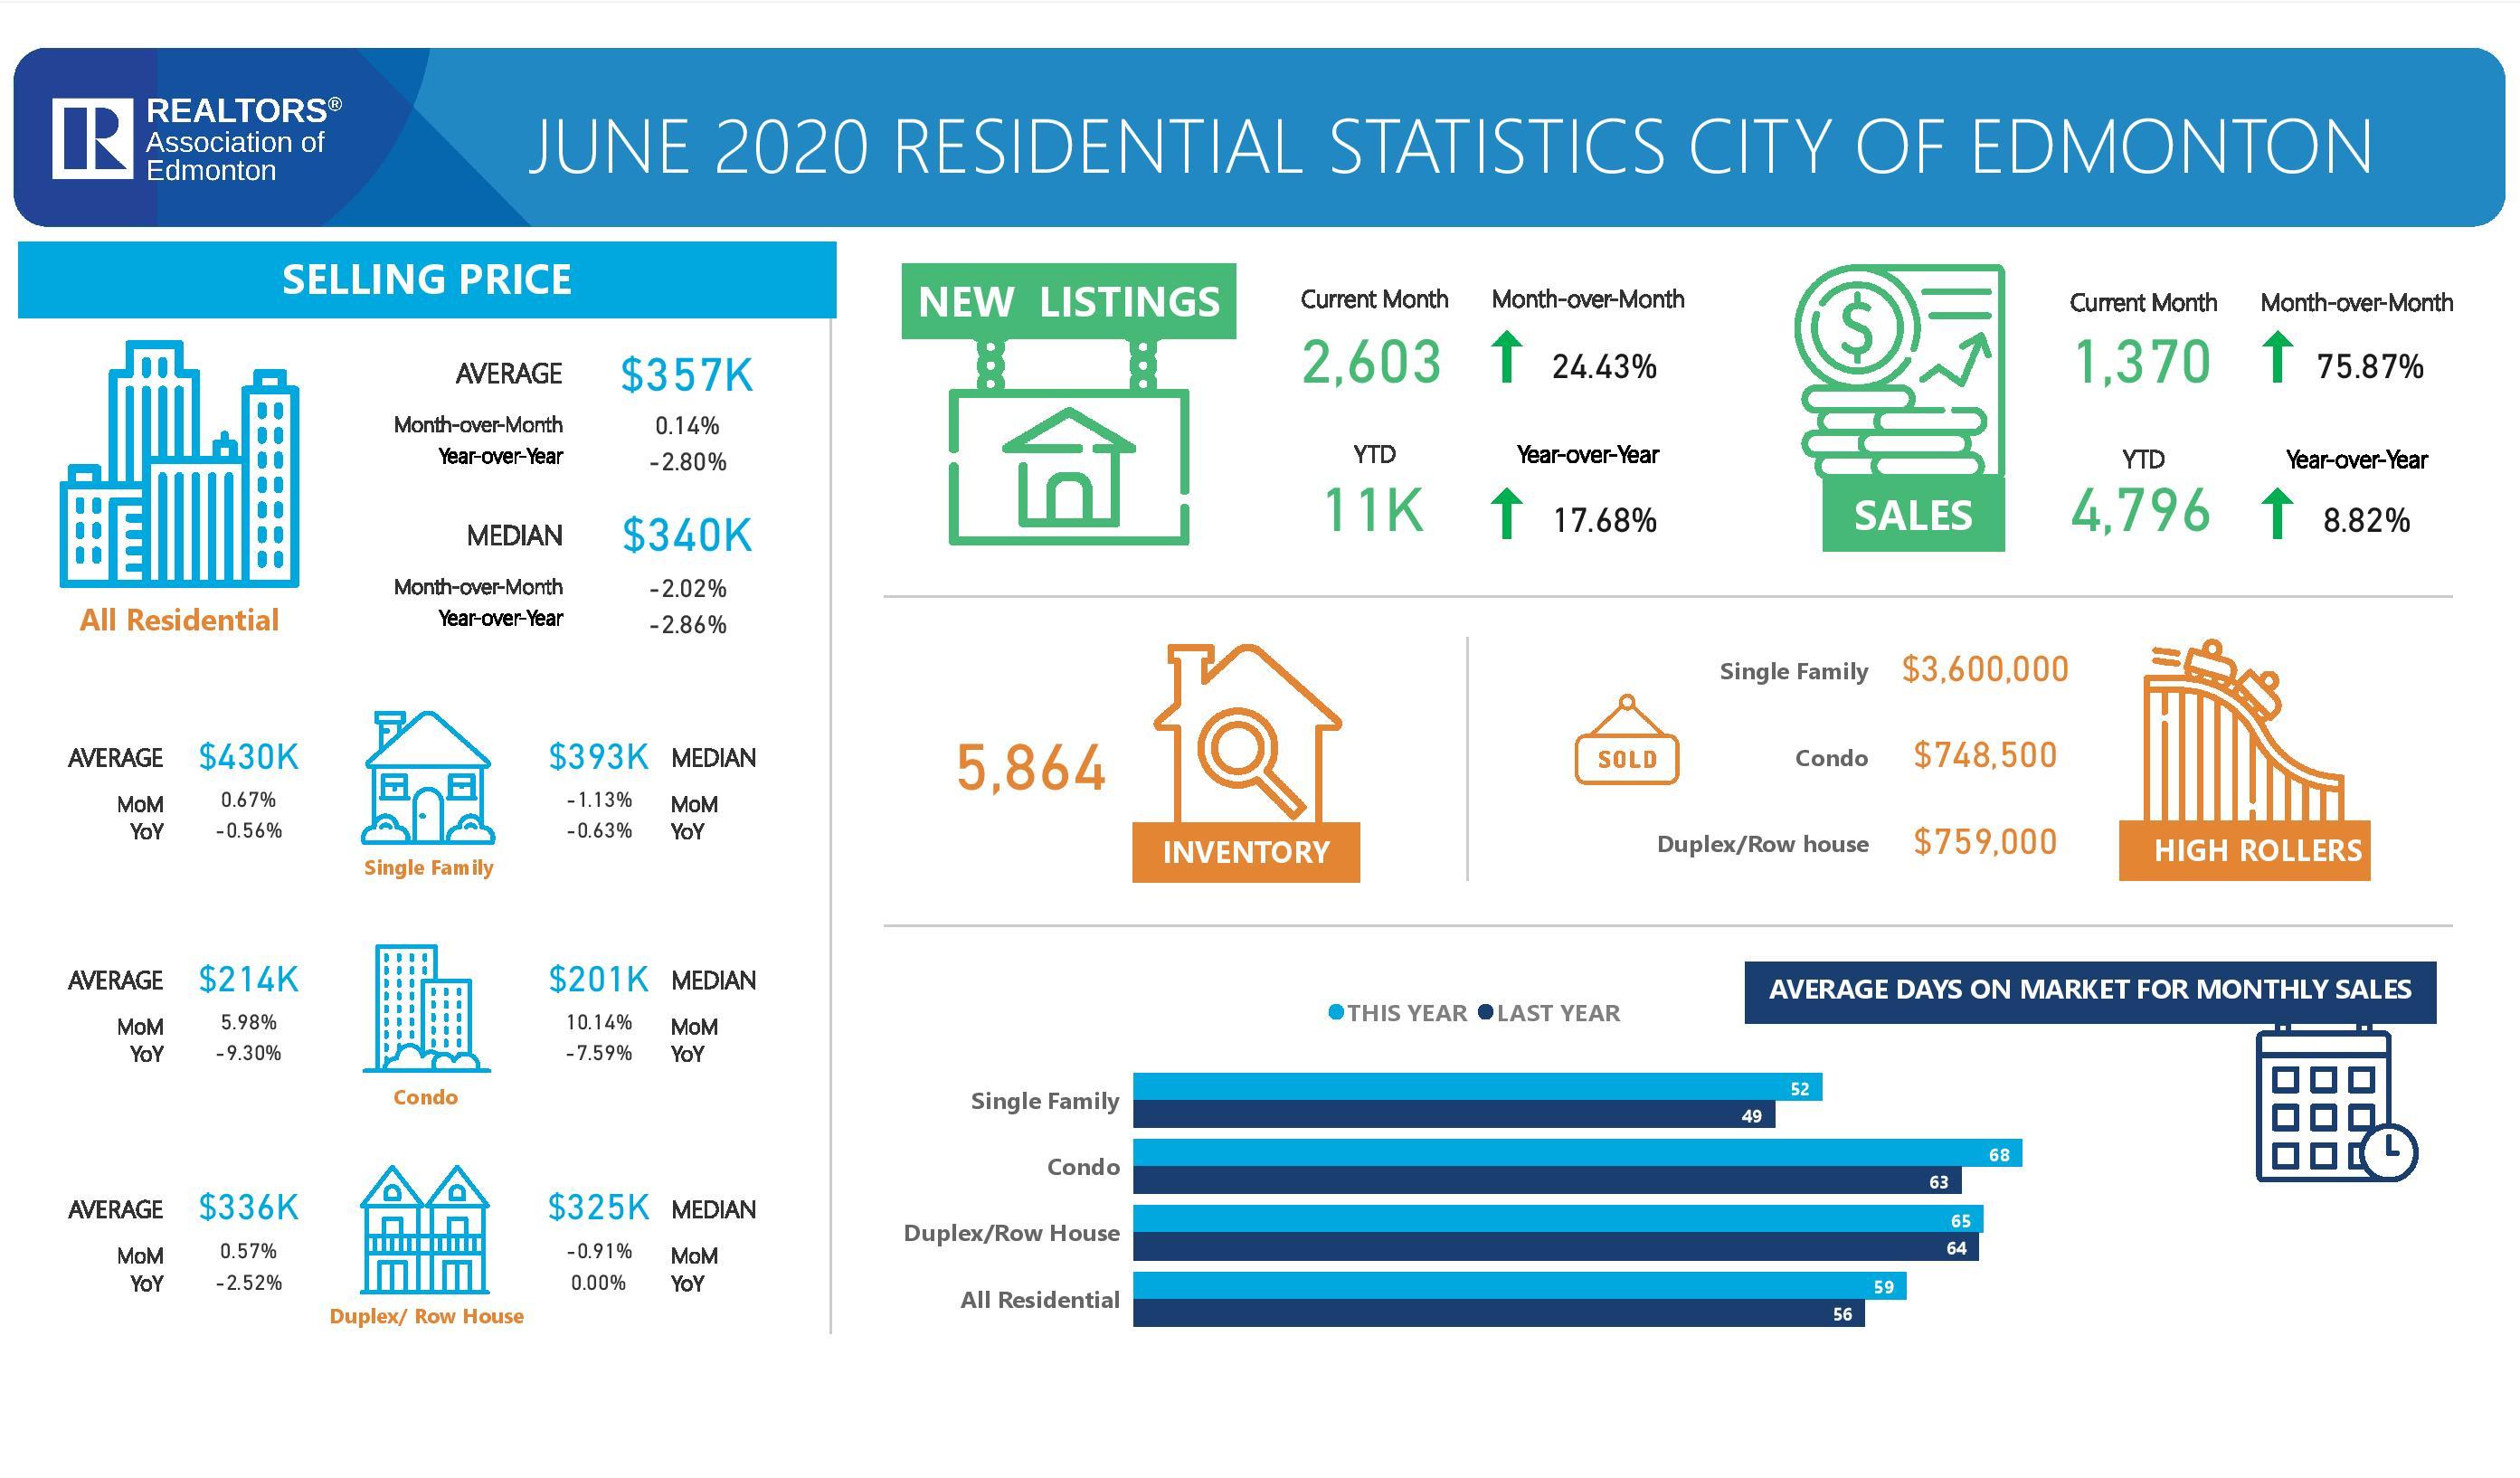 Edmonton Real Estate Market Statistics June 2020